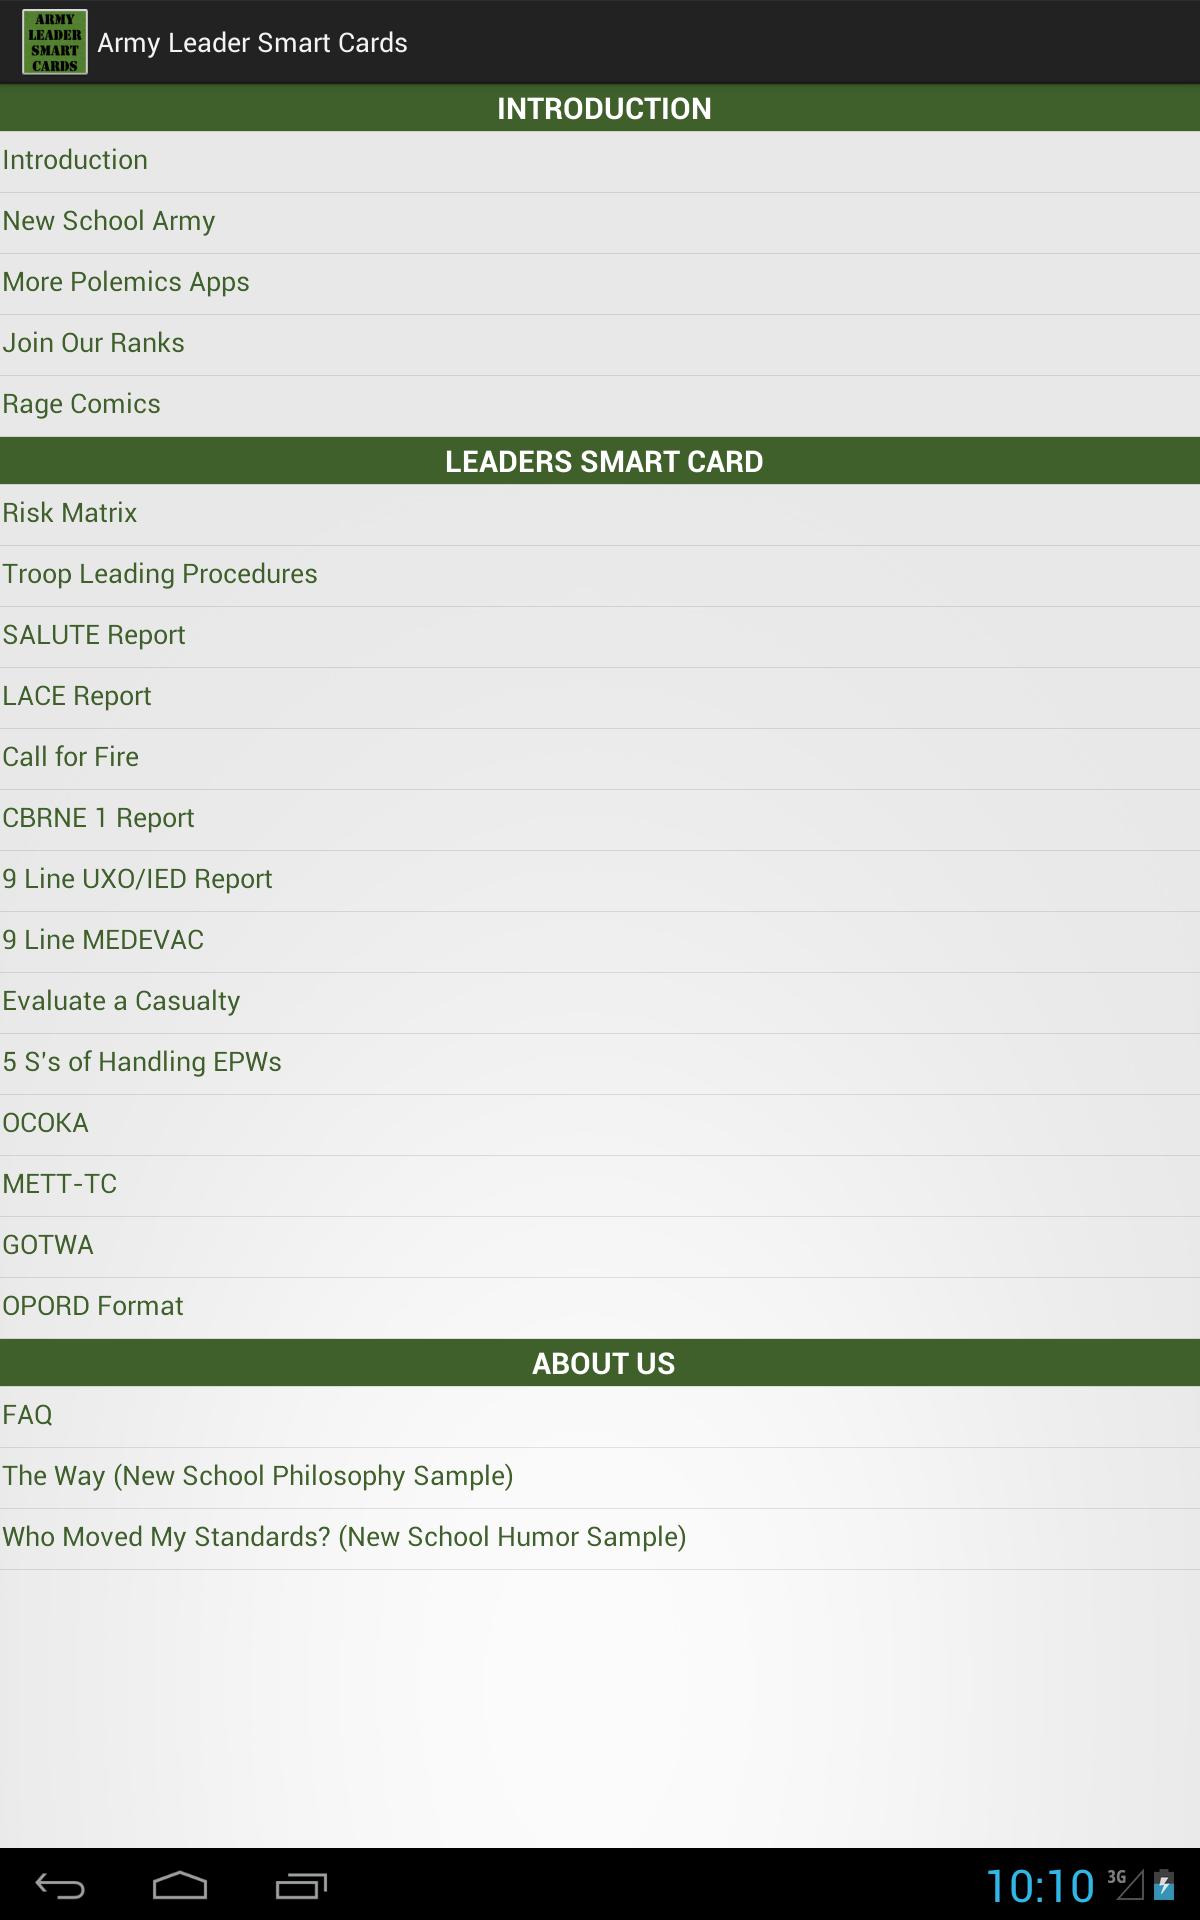 9 Line Medevac Smart Card Pdf Army Leader Cards Reference